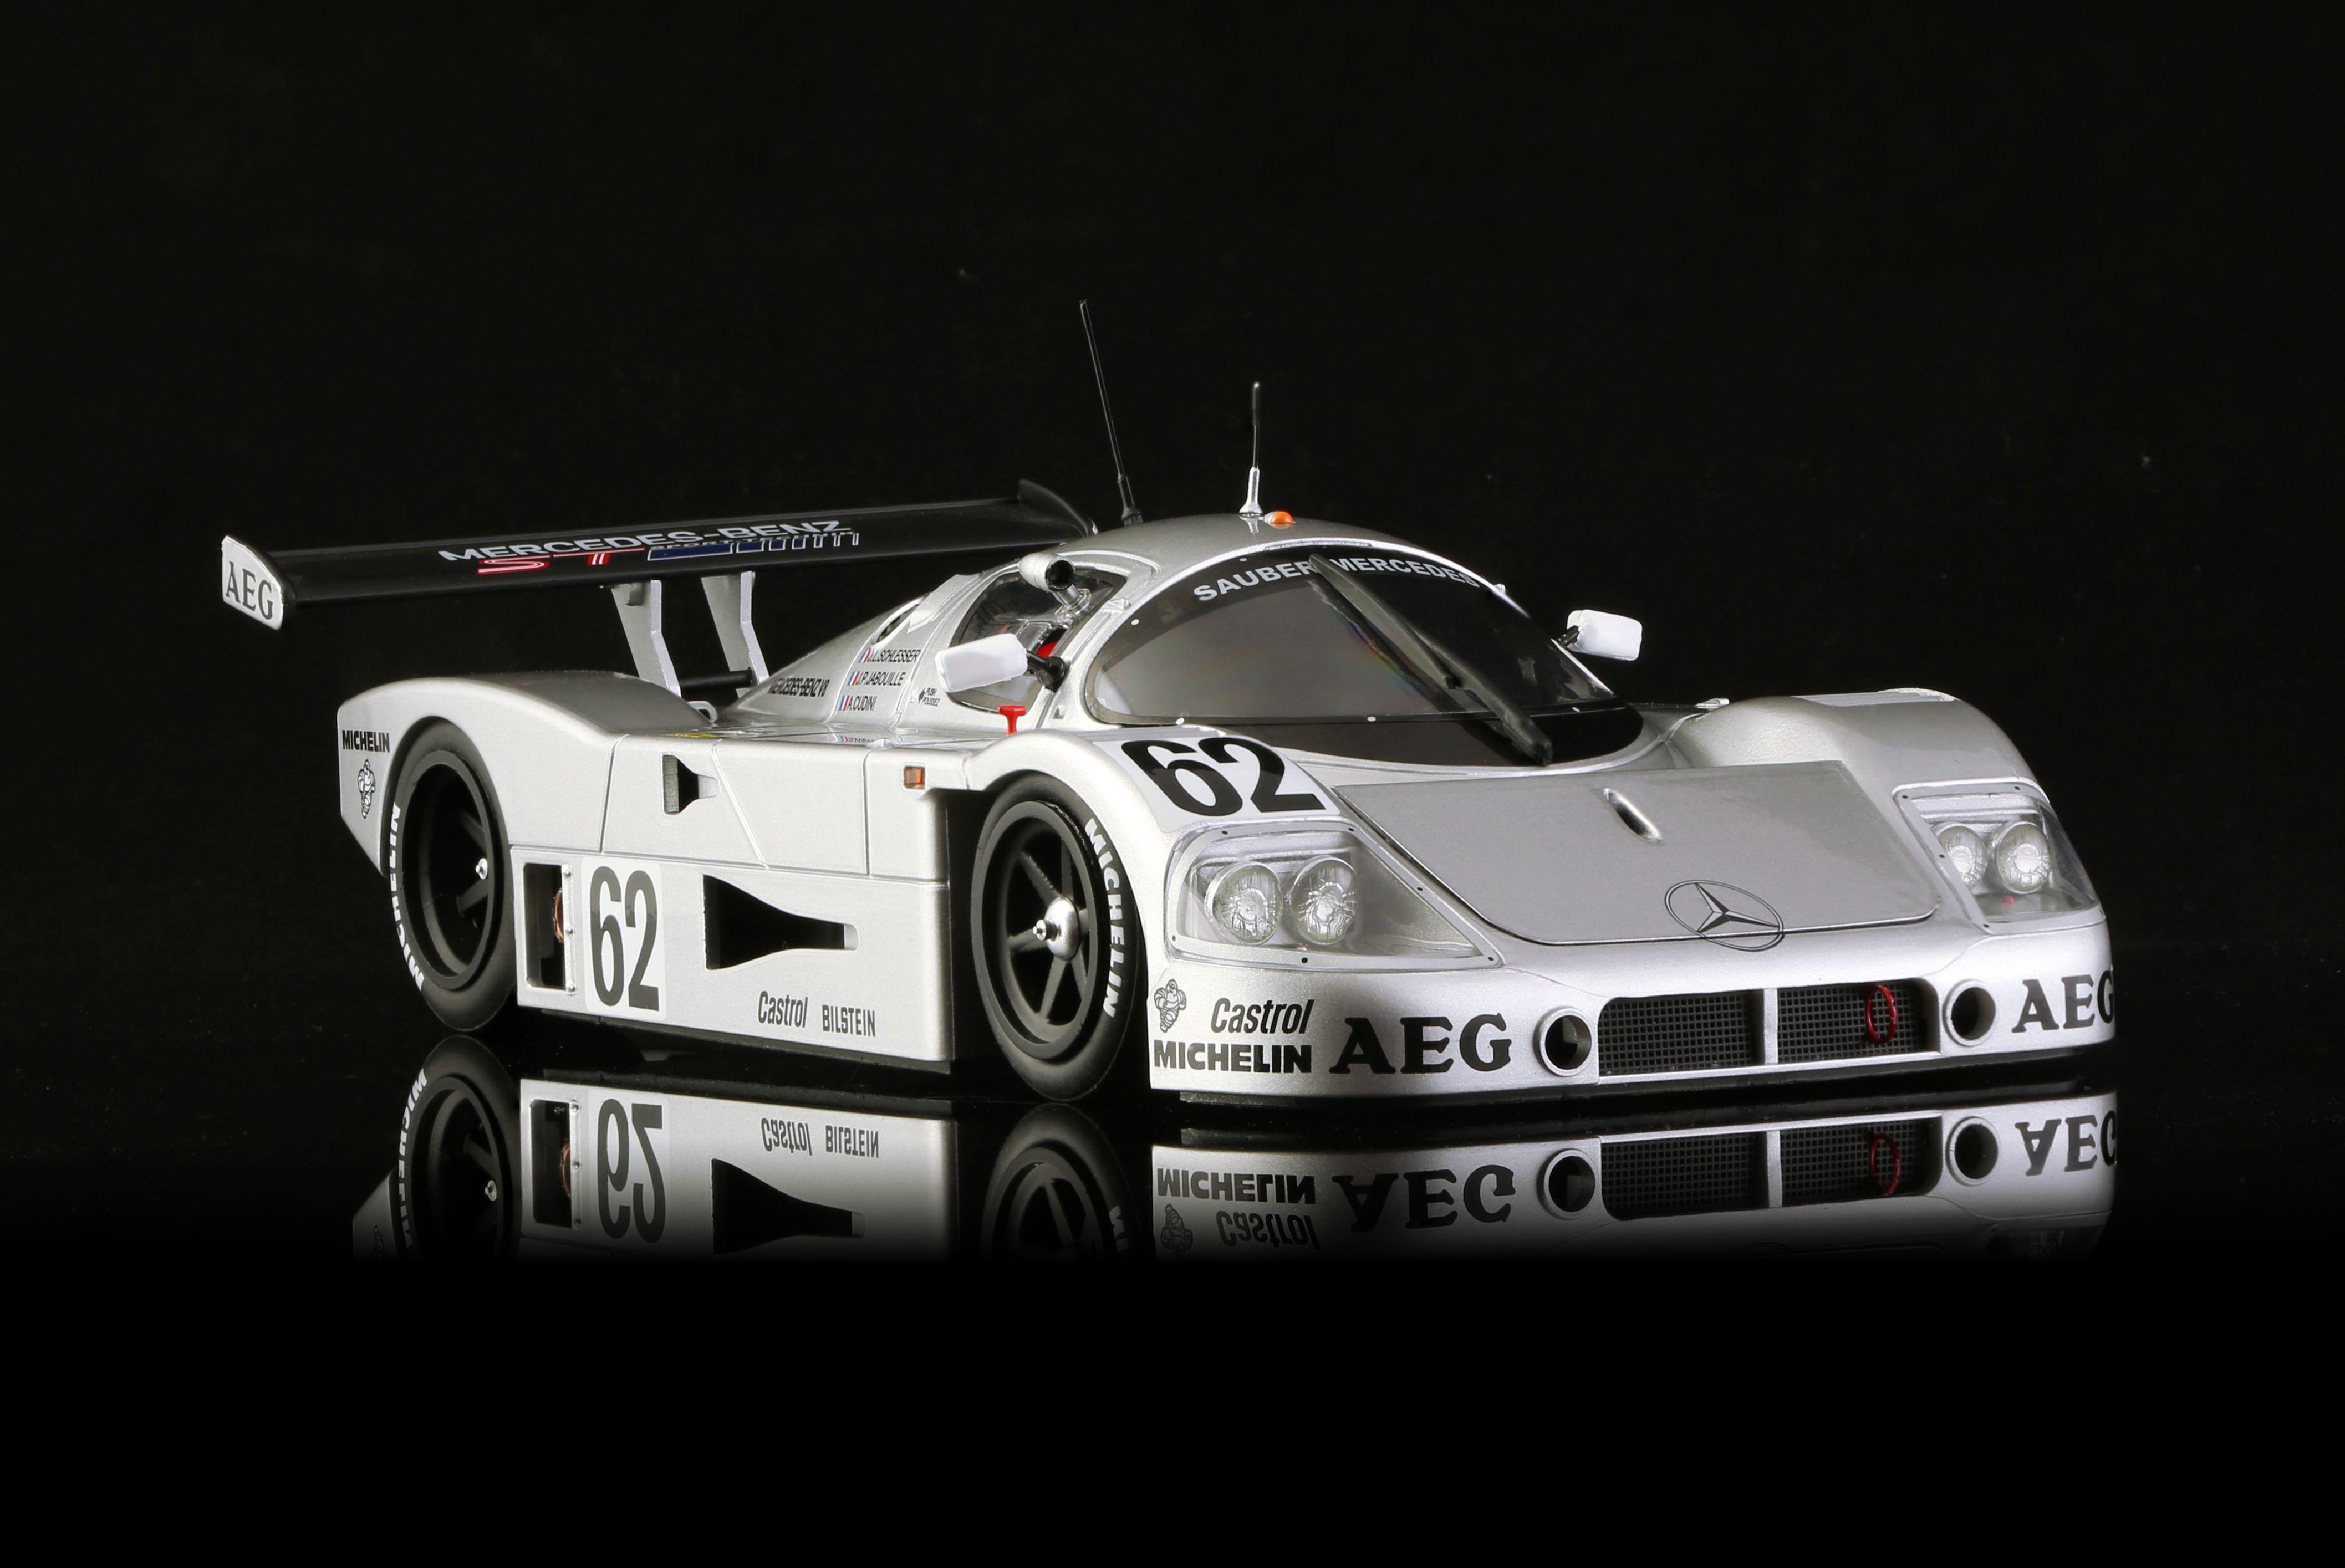 BRM Sauber C9 - Team Sauber Mercedes no.62 - 5th classified 24 H Le Mans 1989